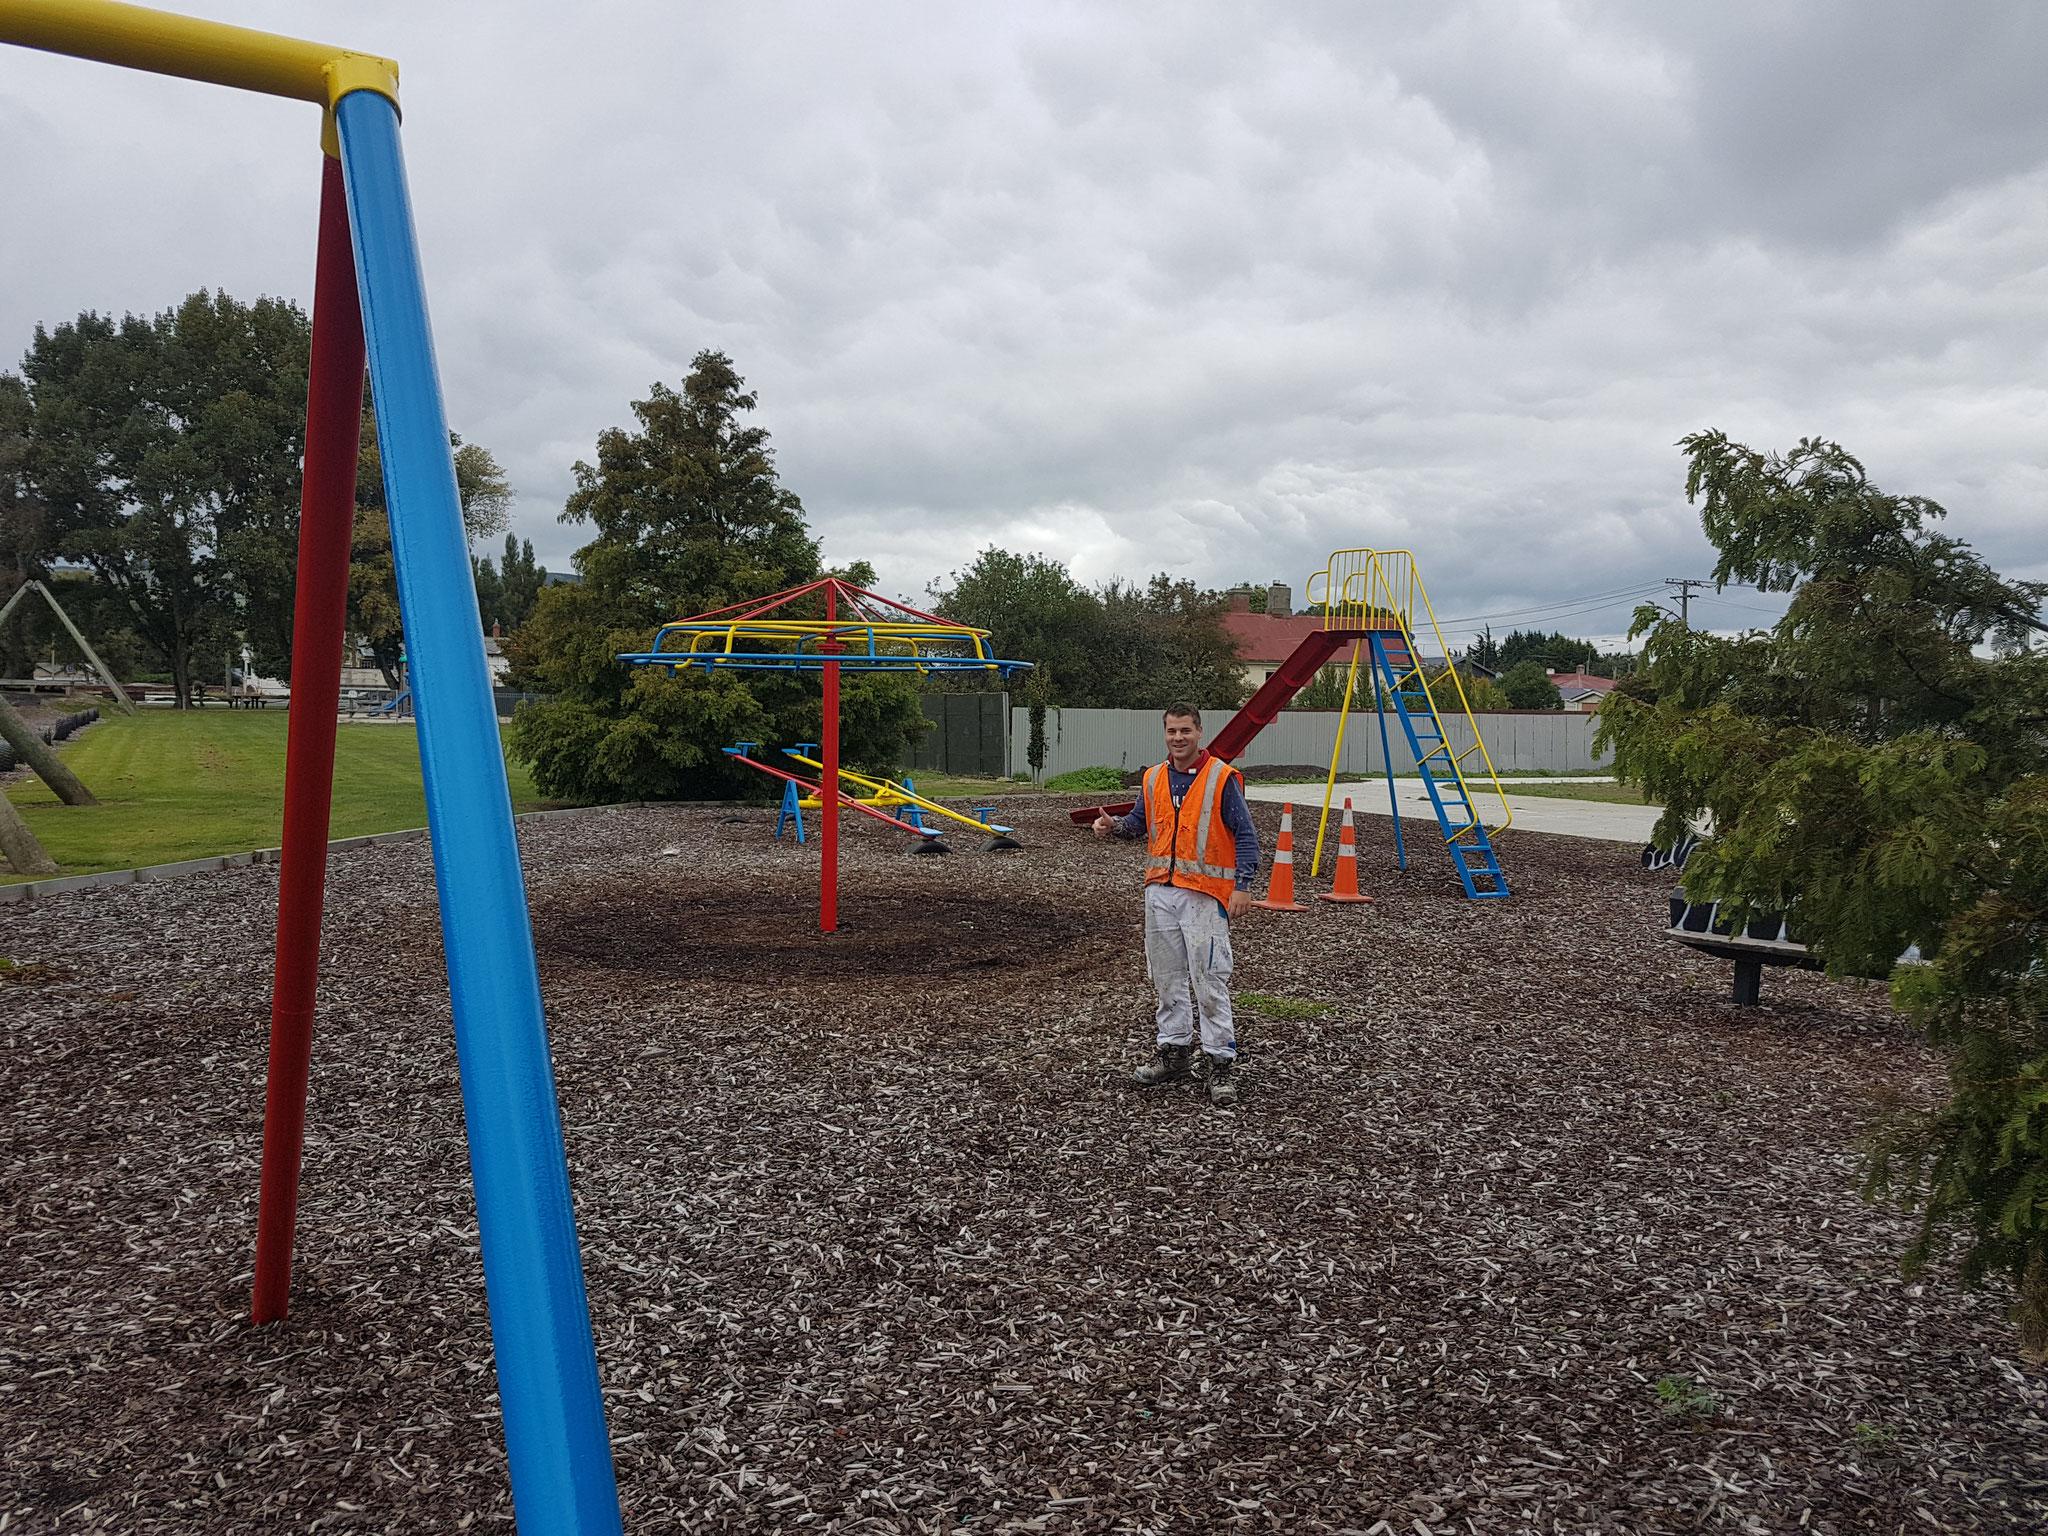 Kinderspielplatz, Neuseeland